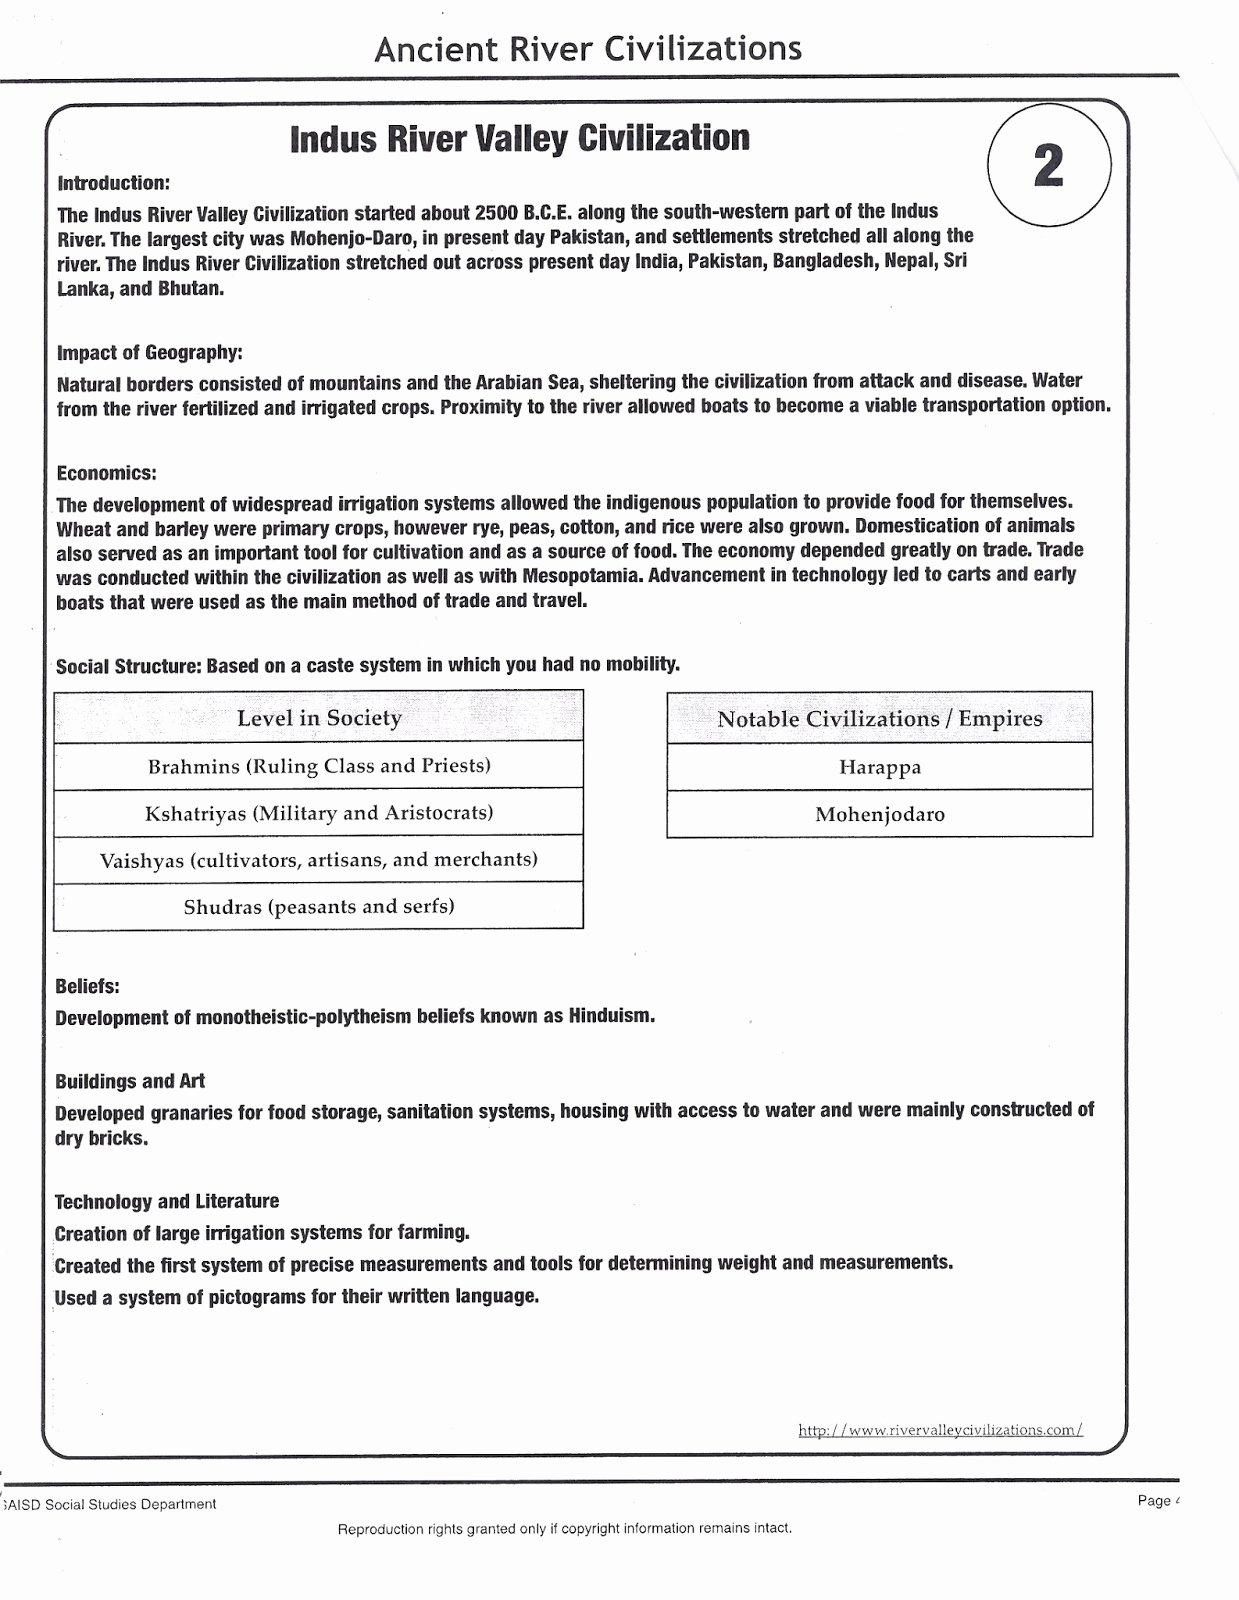 River Valley Civilizations Worksheet Best Of River Valley Civilizations Worksheet Answer Key